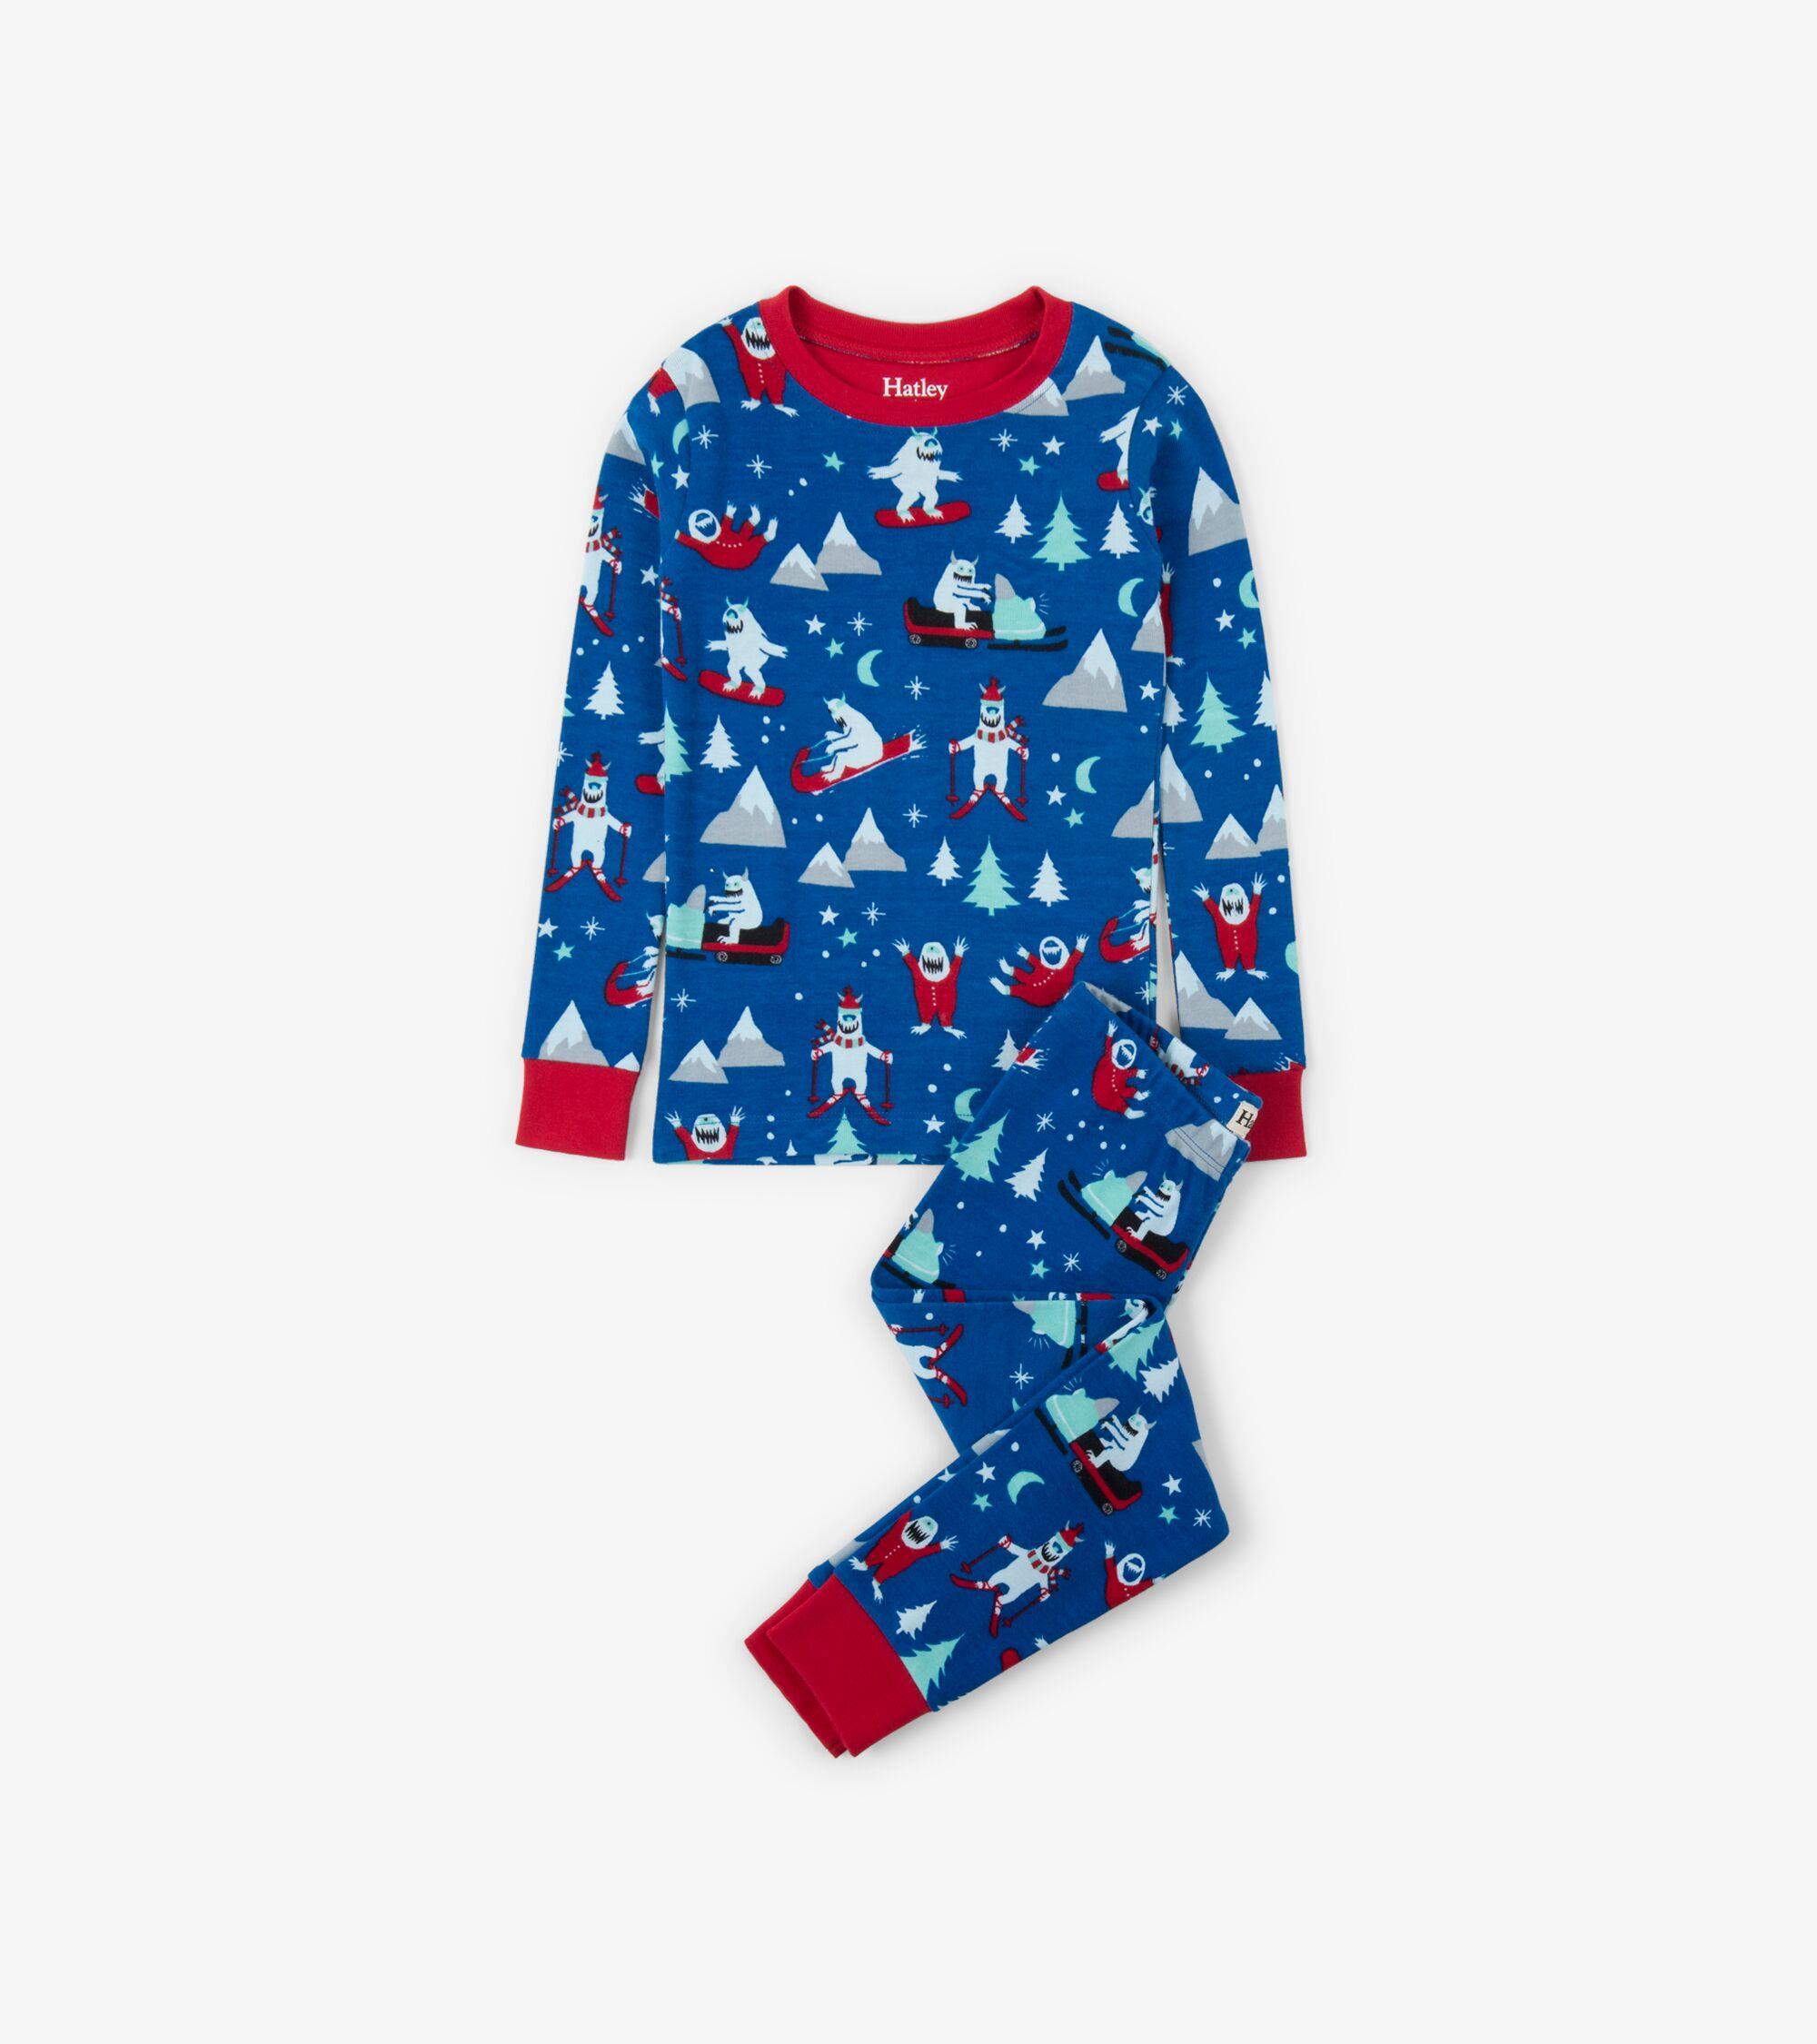 Hatley Mountain Monsters Organic Cotton Pyjamas - Catfish Kids